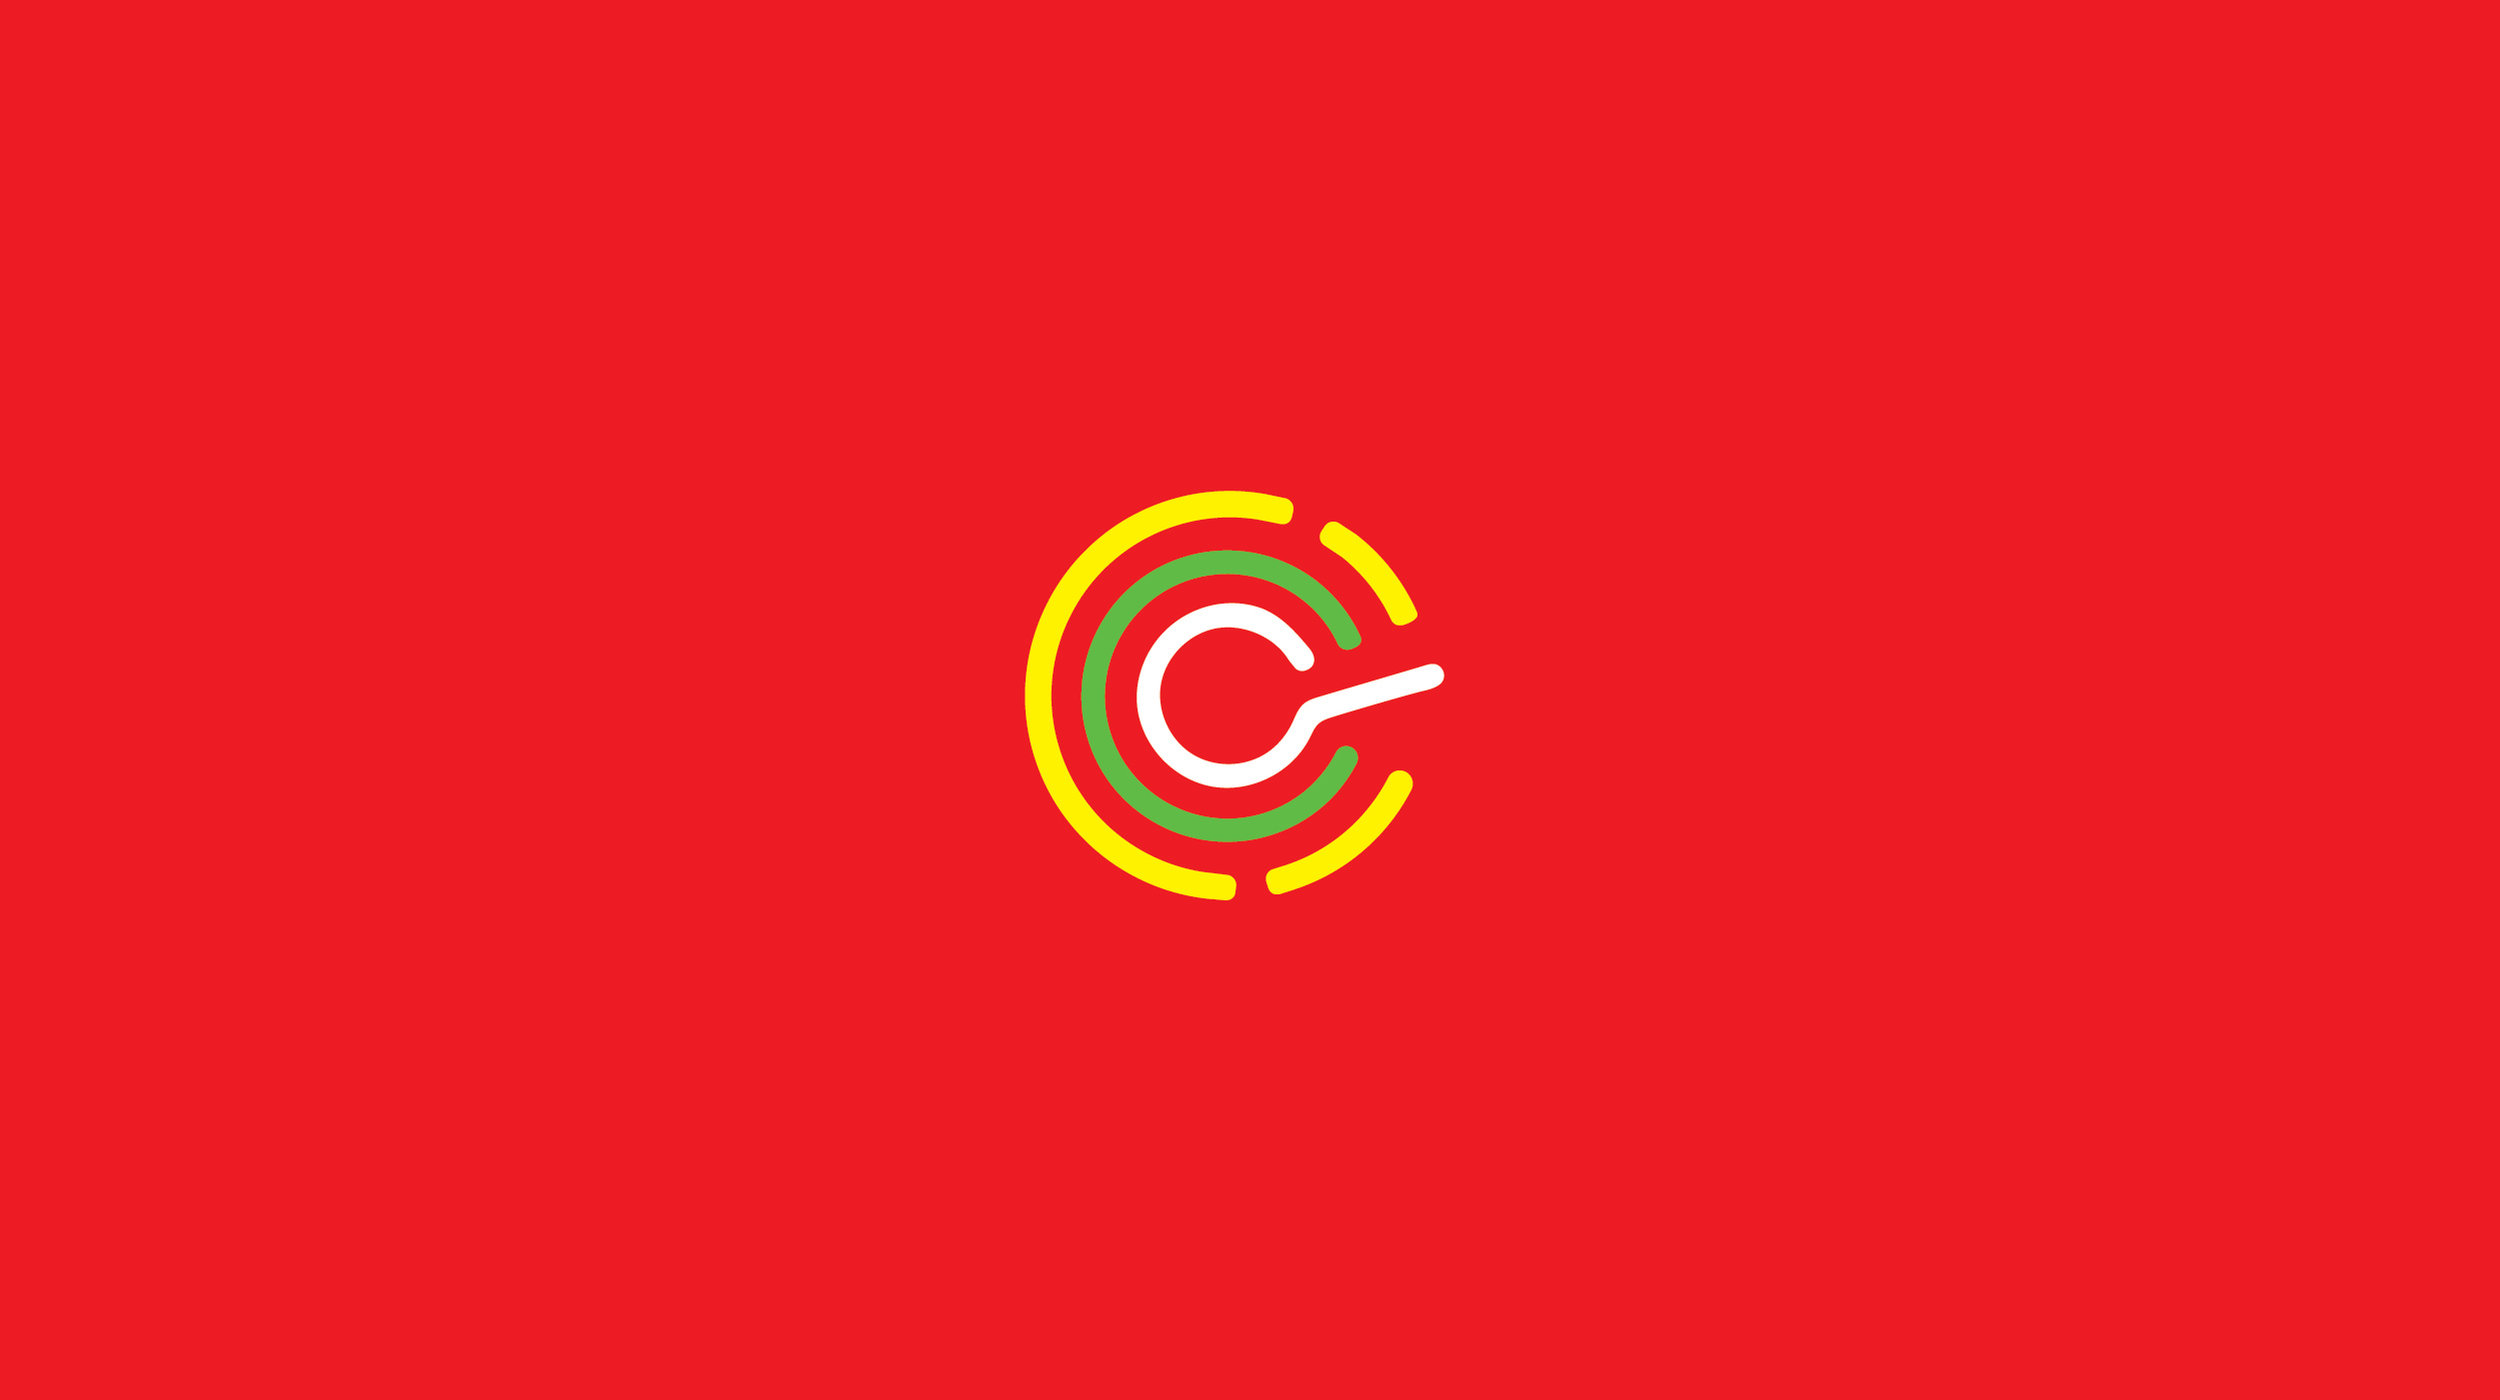 Logo-Design-Icons-Branding